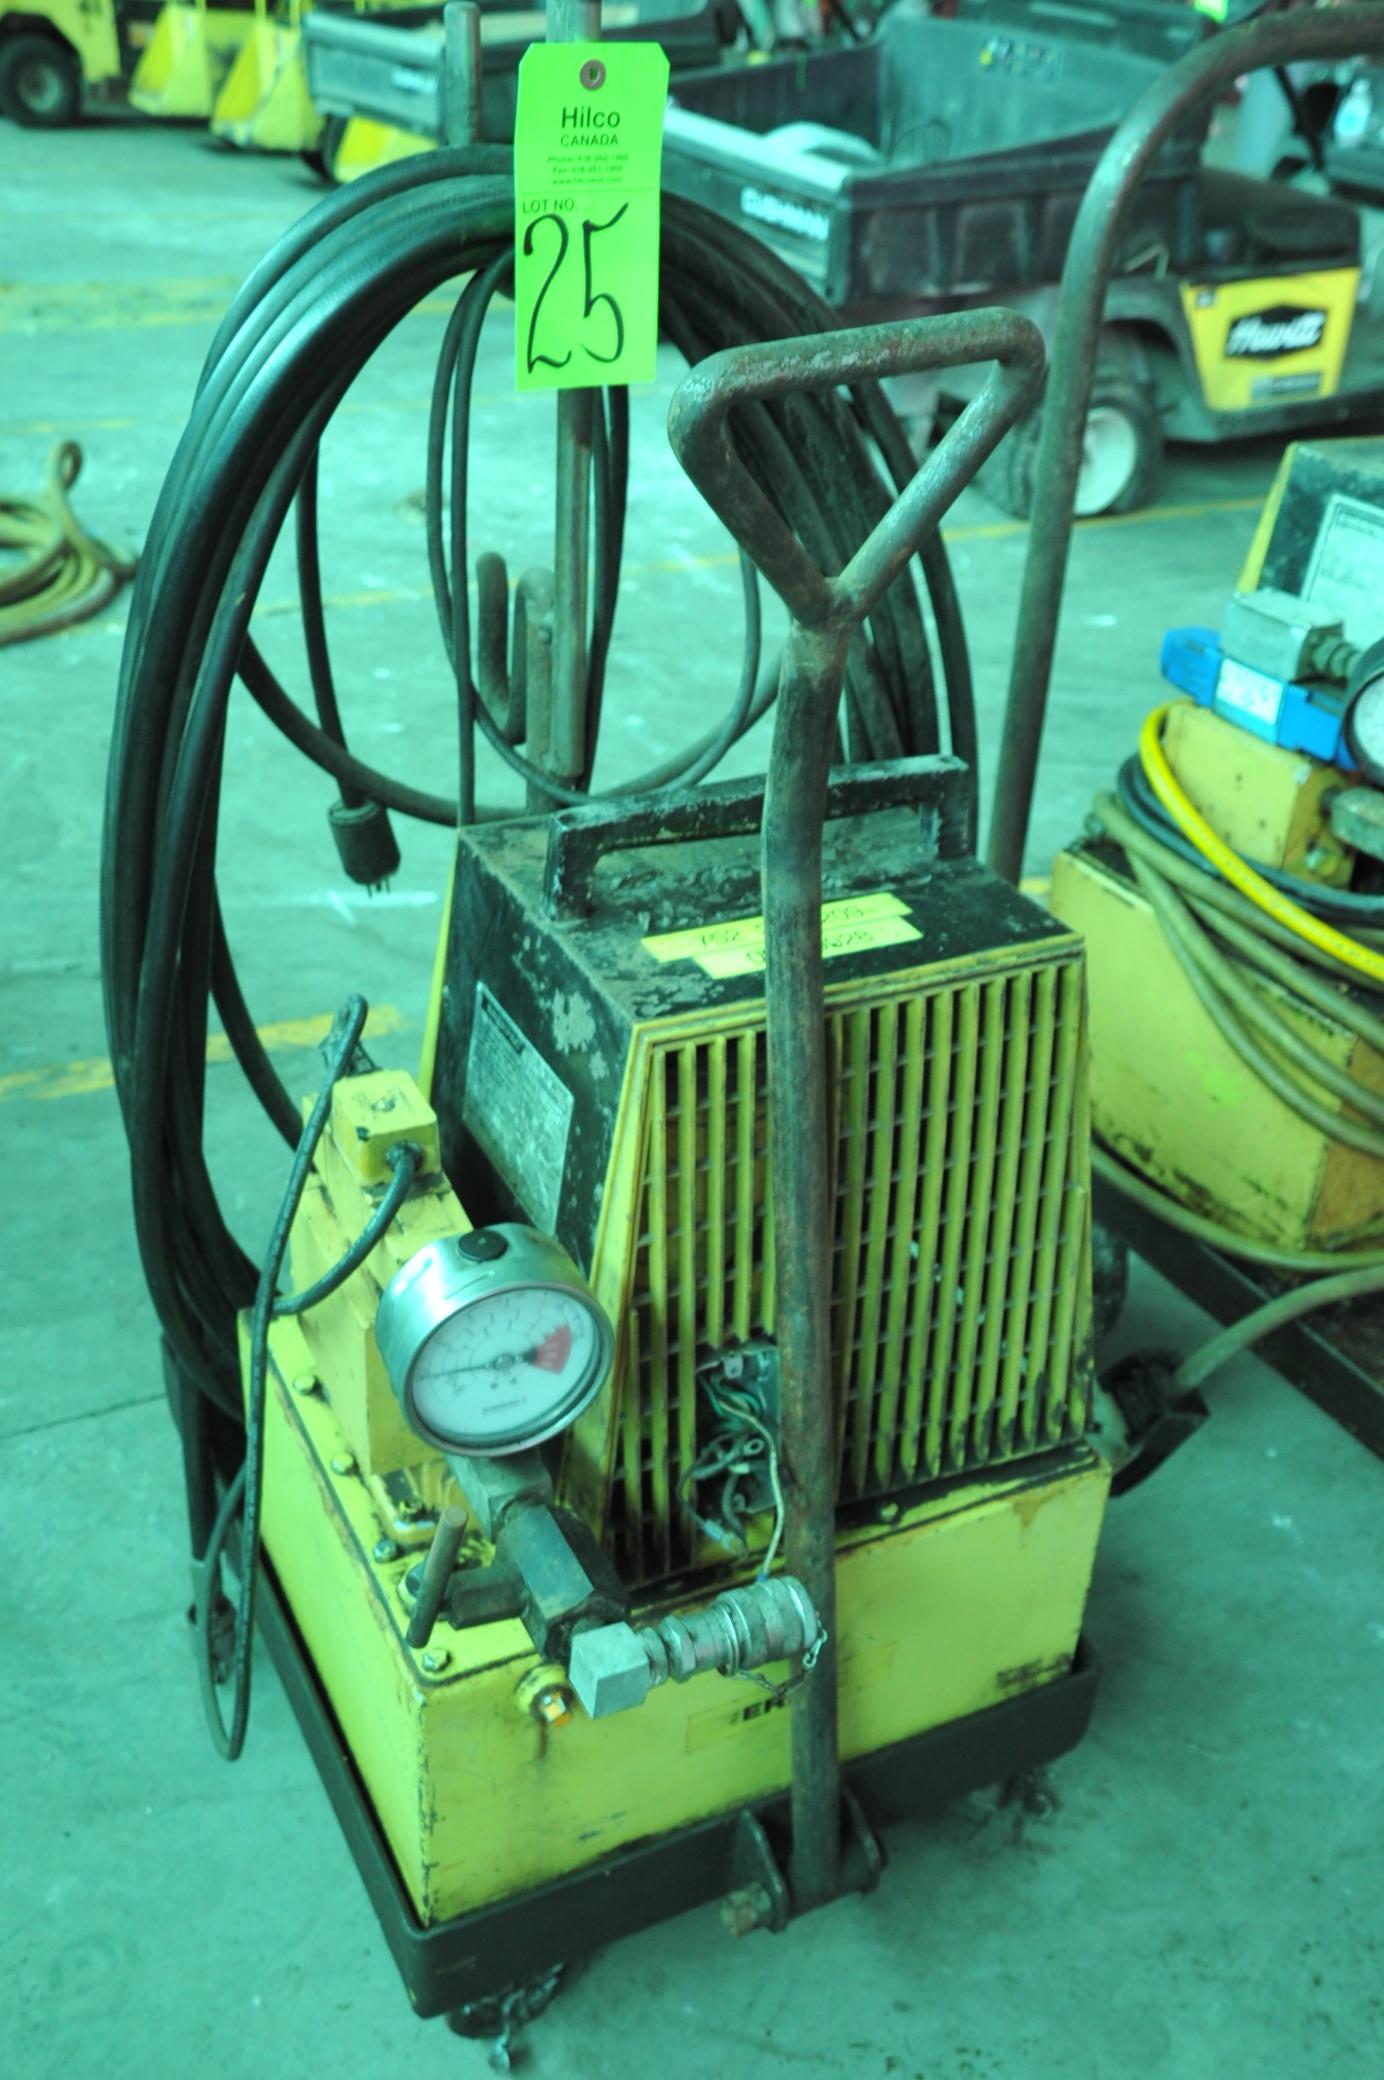 Lot 25 - Enerpac Model PER 2045 1 Hp, 115V, Hydraulic Power Pack